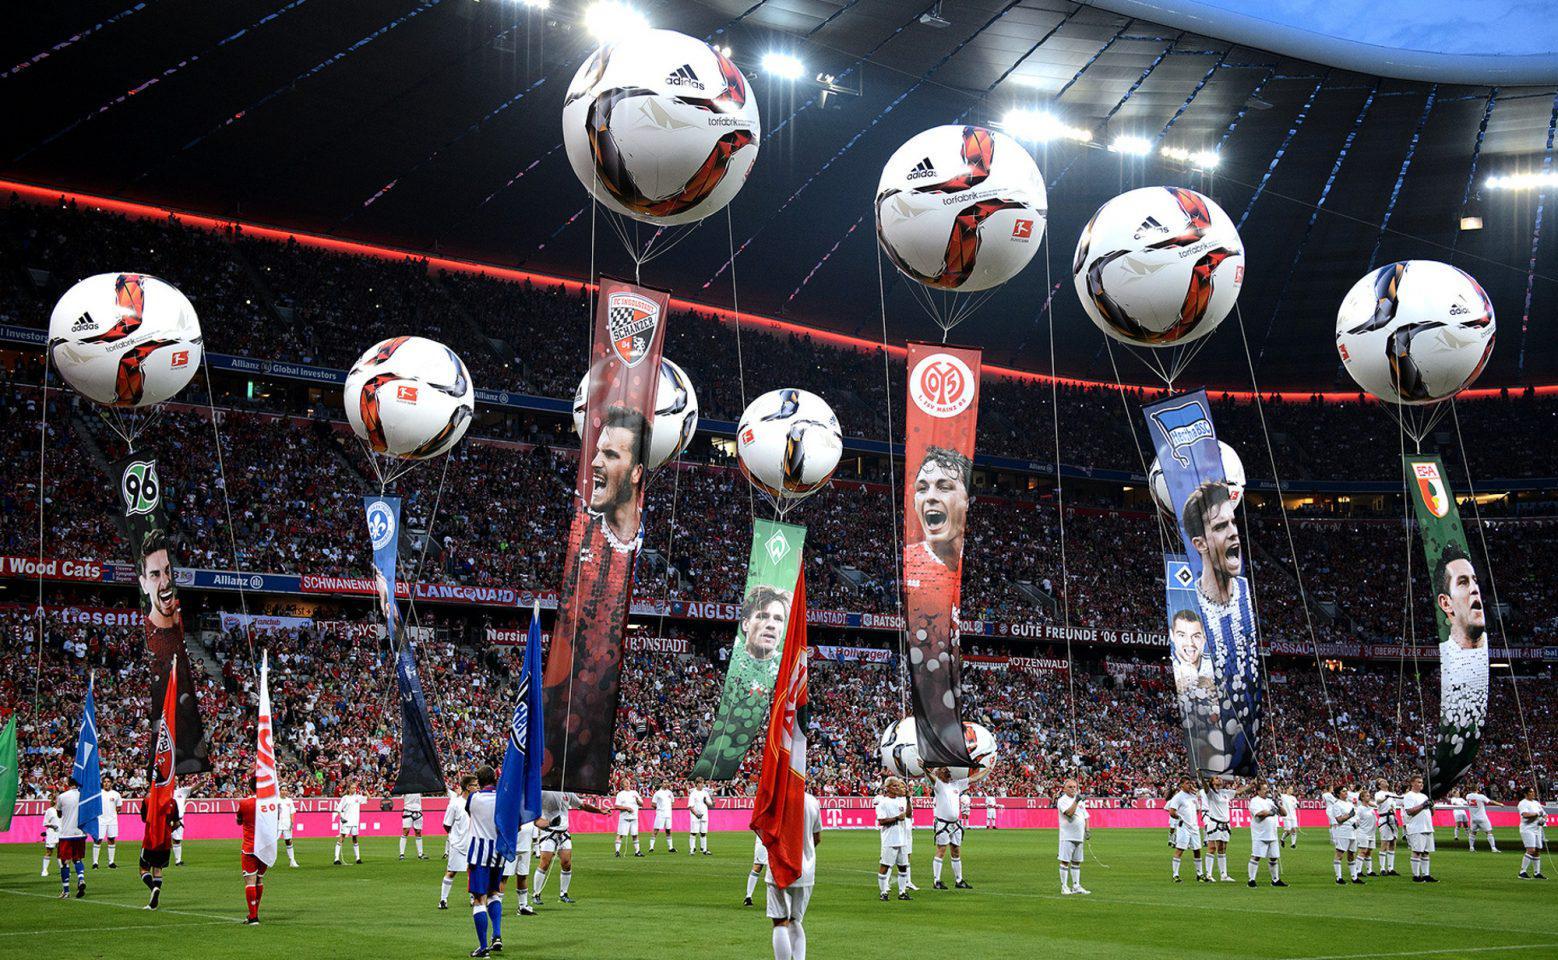 Bundesliga: Επανεκκίνηση στις 15 Μαΐου - Έγιναν 1.724 τεστ κορωνοϊού με 10 θετικά